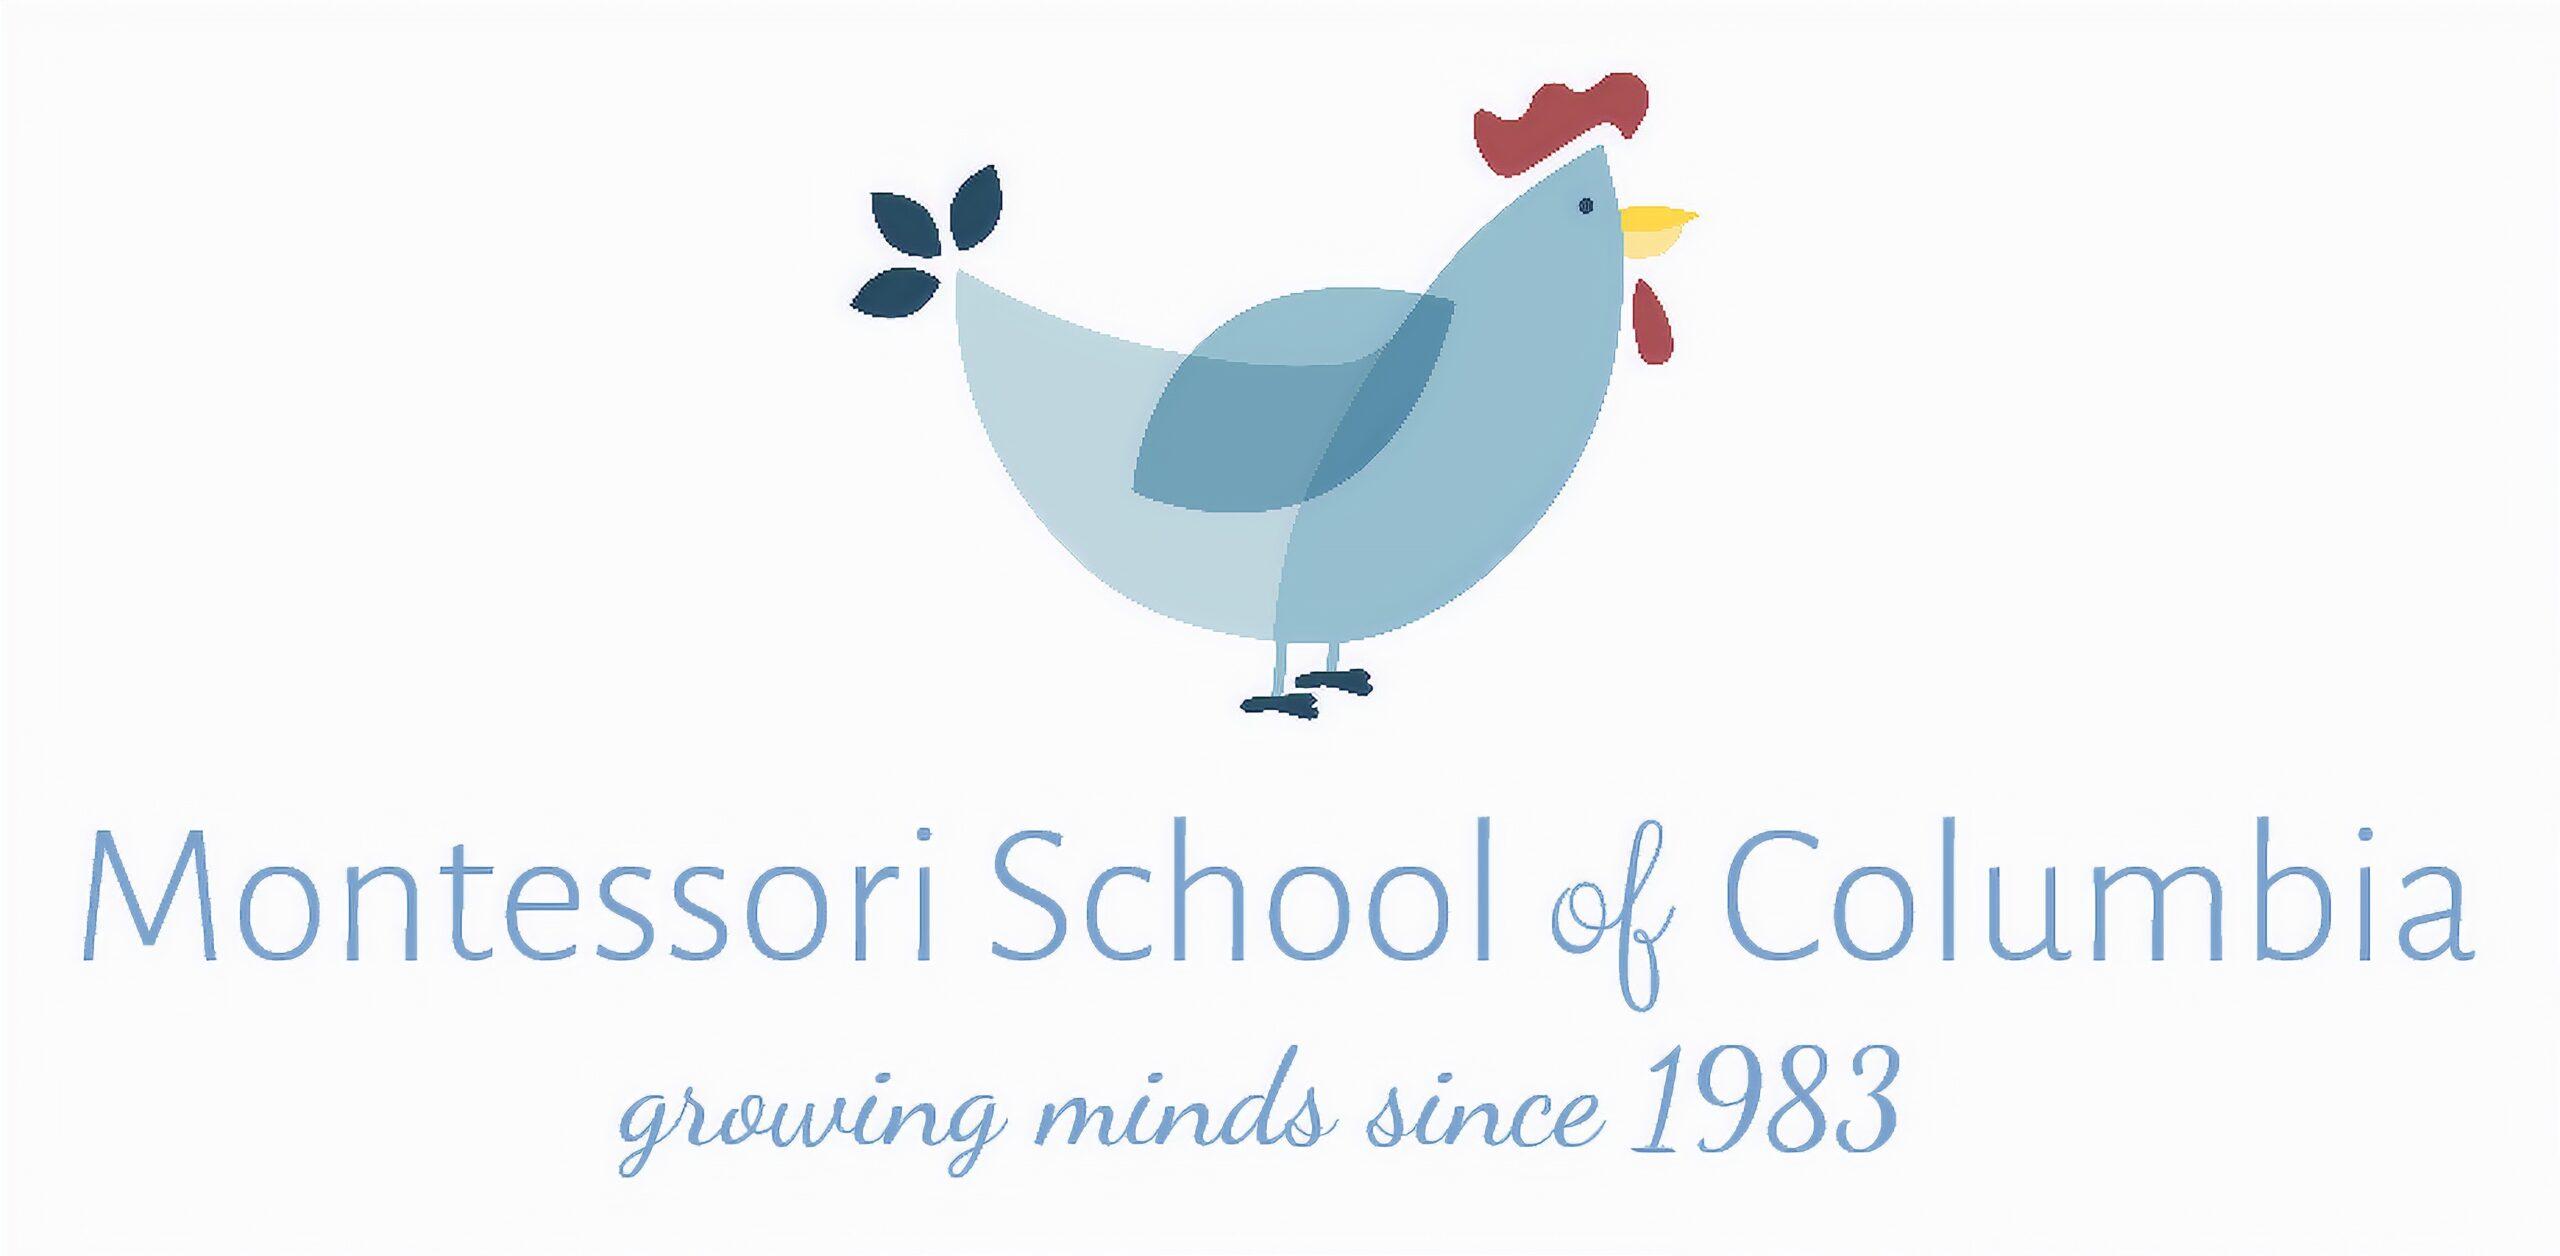 Montessori School of Columbia